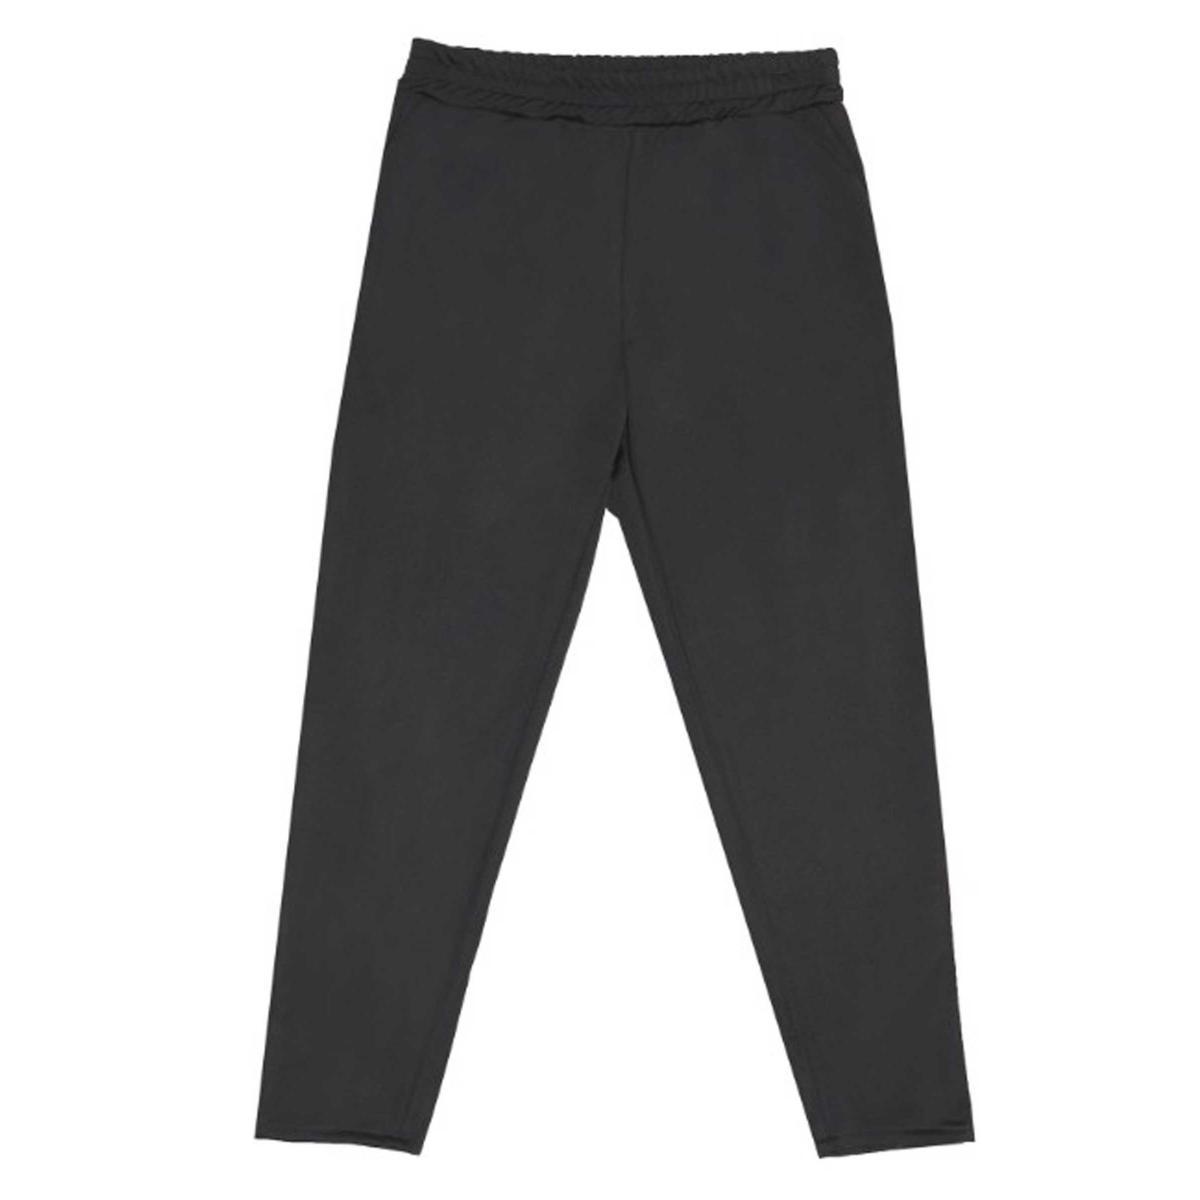 Pantalone tuta ADALET con bande laterali unisex rif. AD048